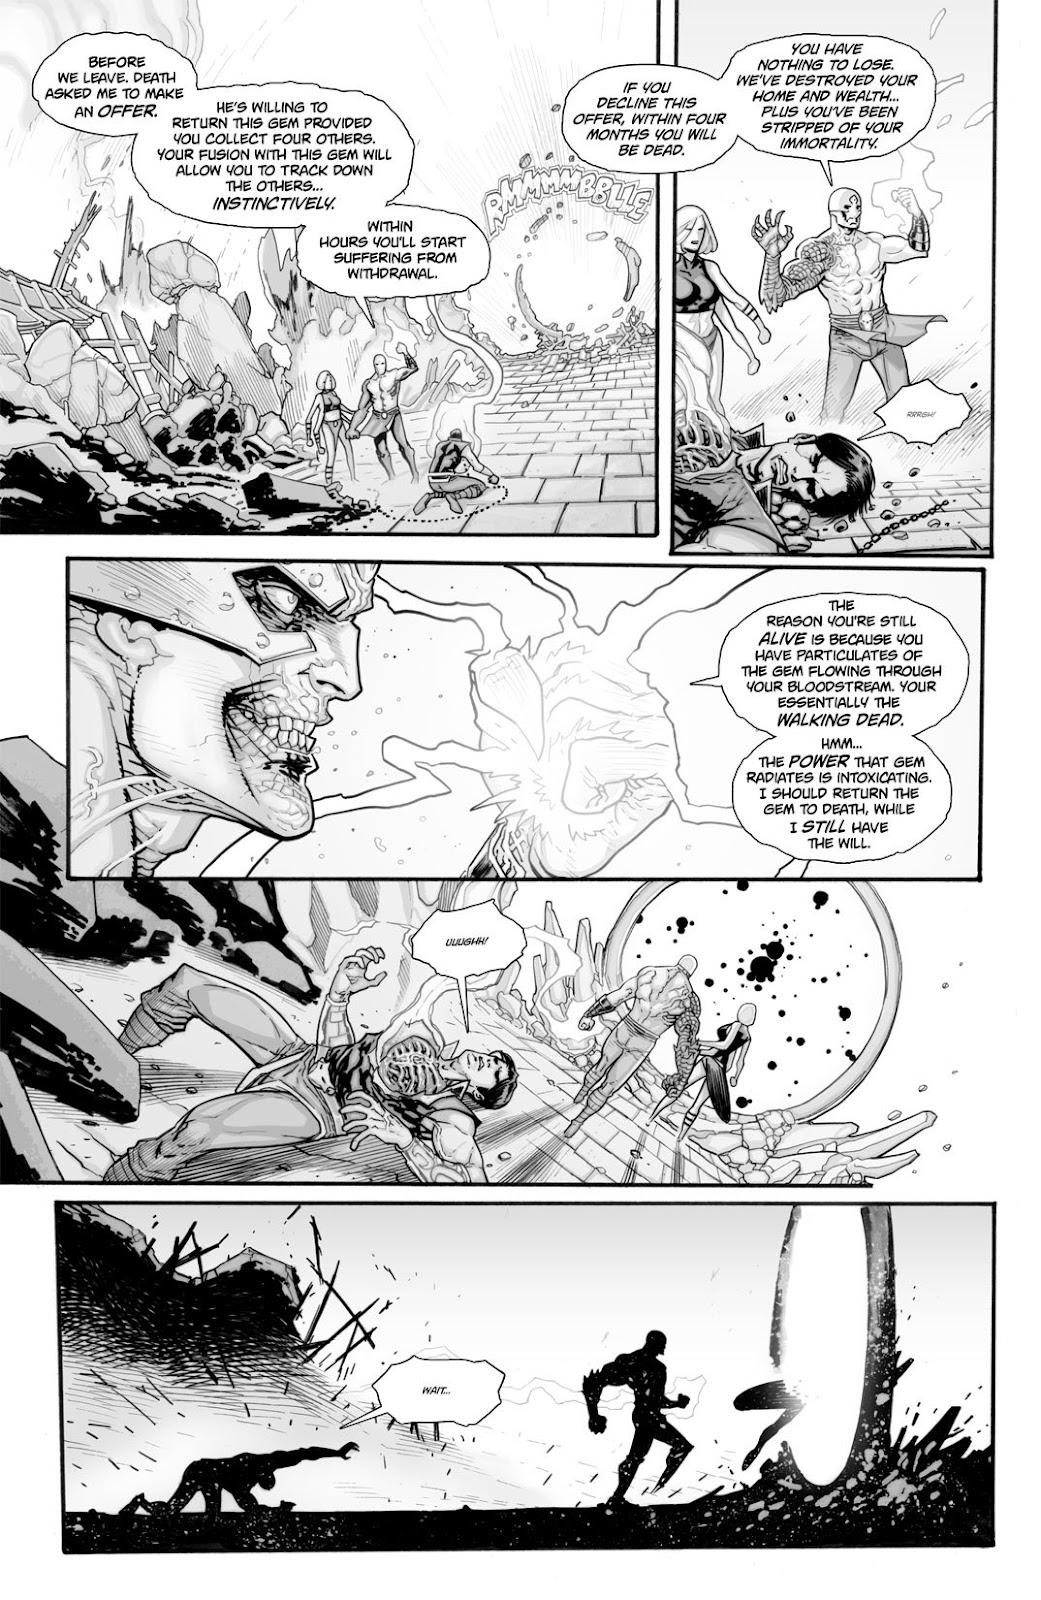 Read online Reaper comic -  Issue #2 - 32